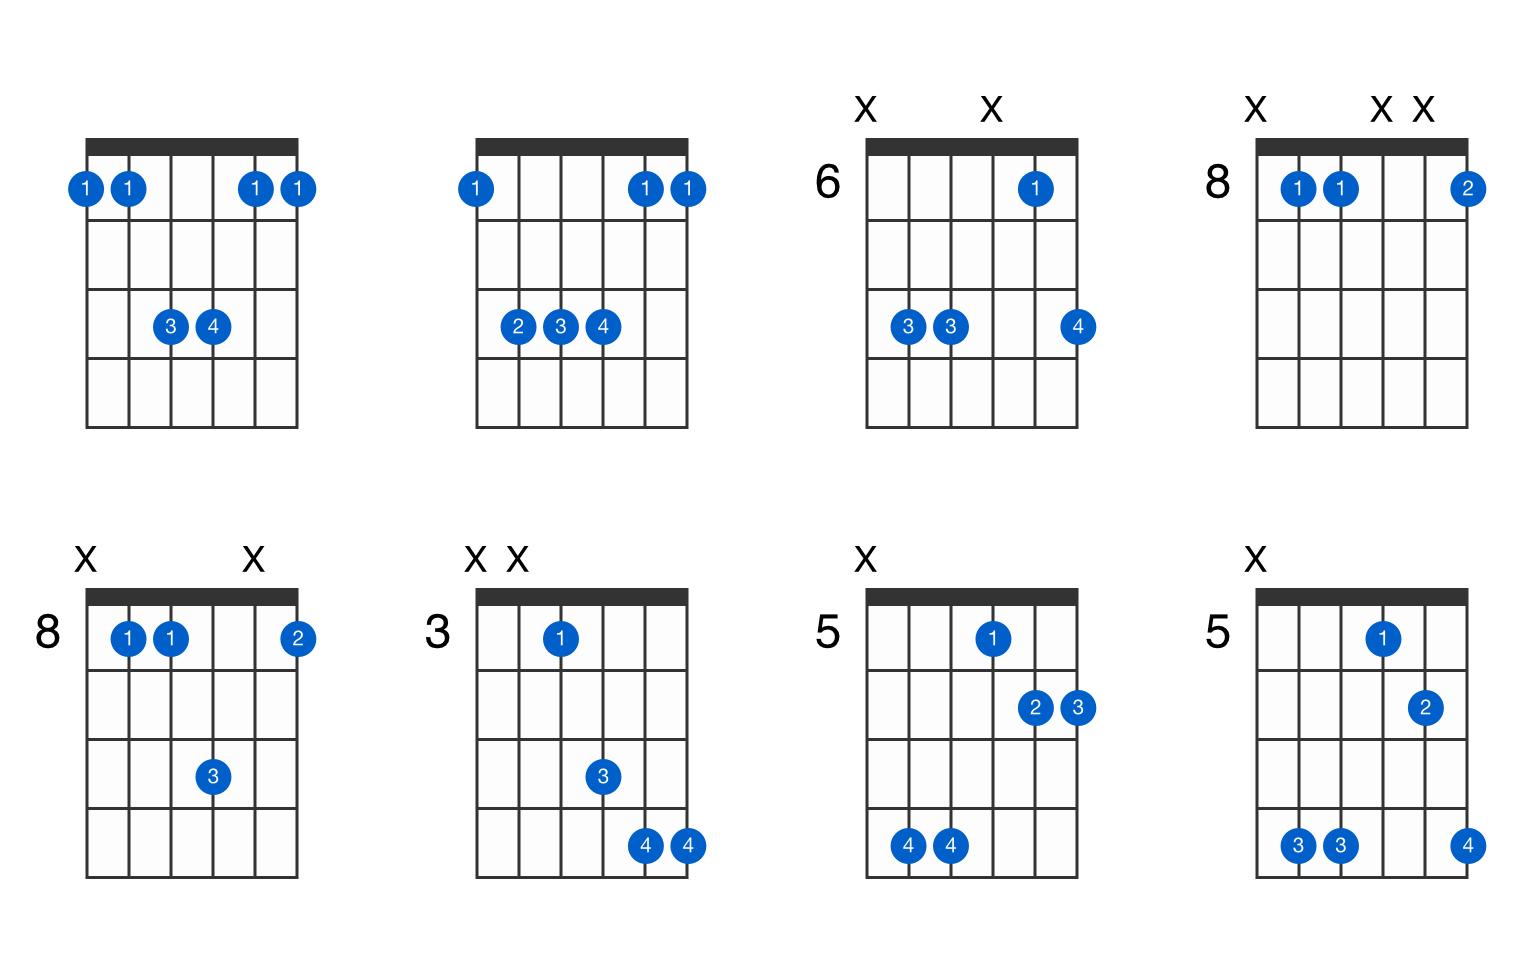 Fsus15 guitar chord   GtrLib Chords